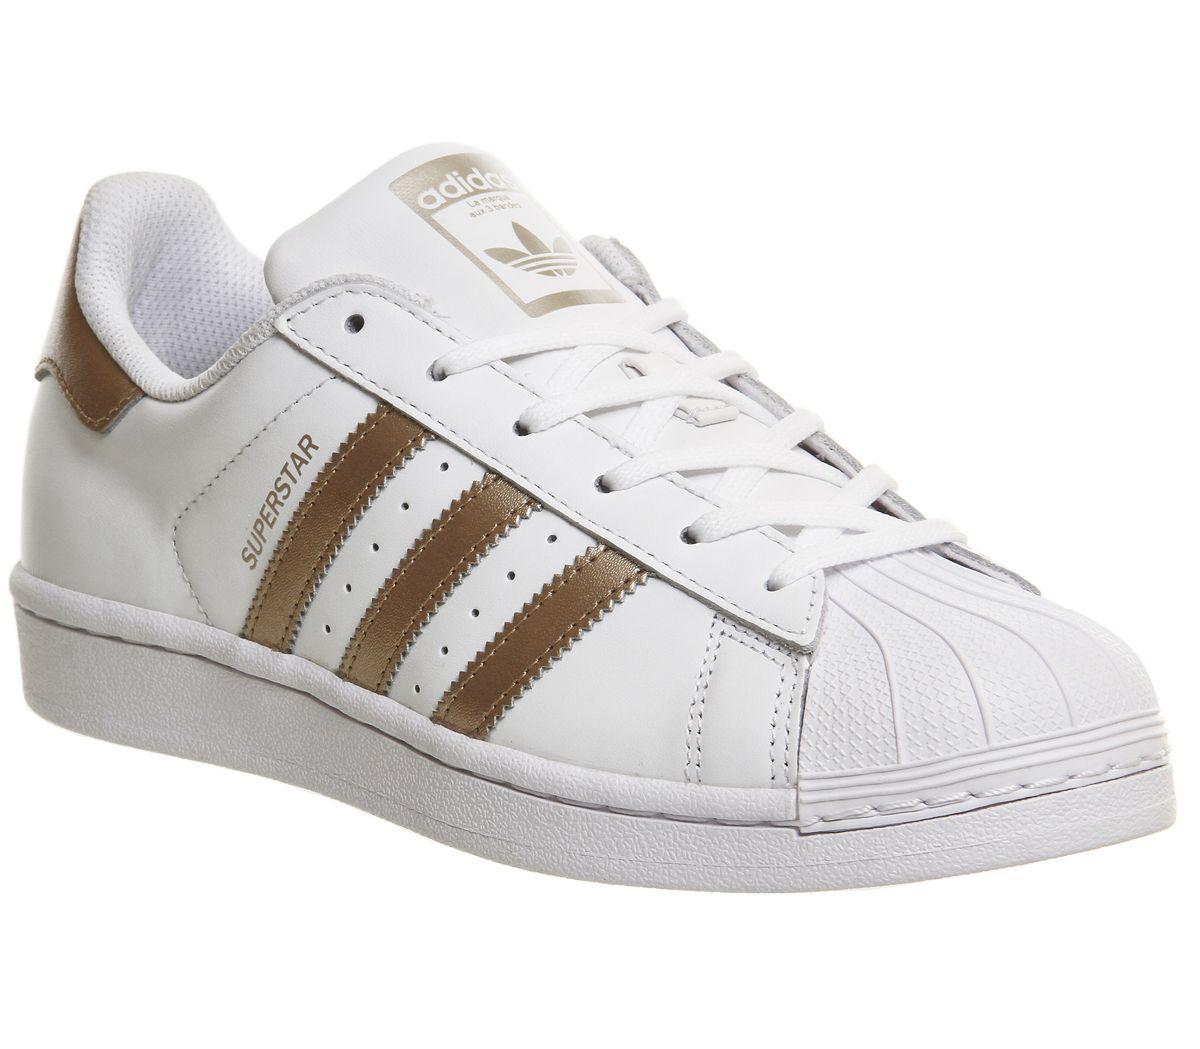 81da6dd1a338 adidas Superstar 1 White Copper - Hers trainers